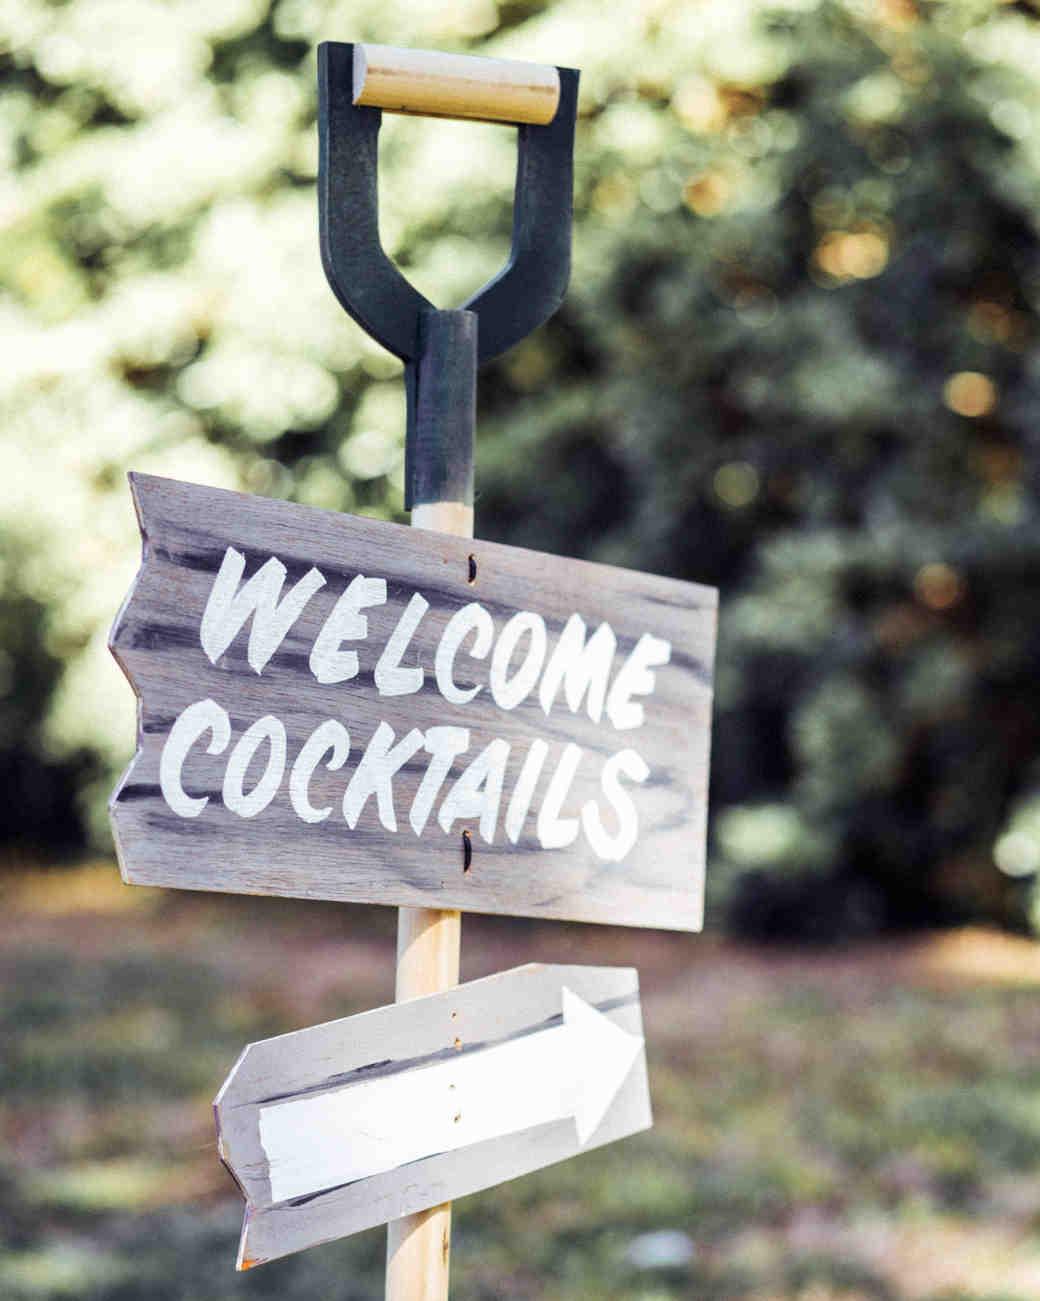 leah-michael-wedding-signage-1148-s111861-0515.jpg